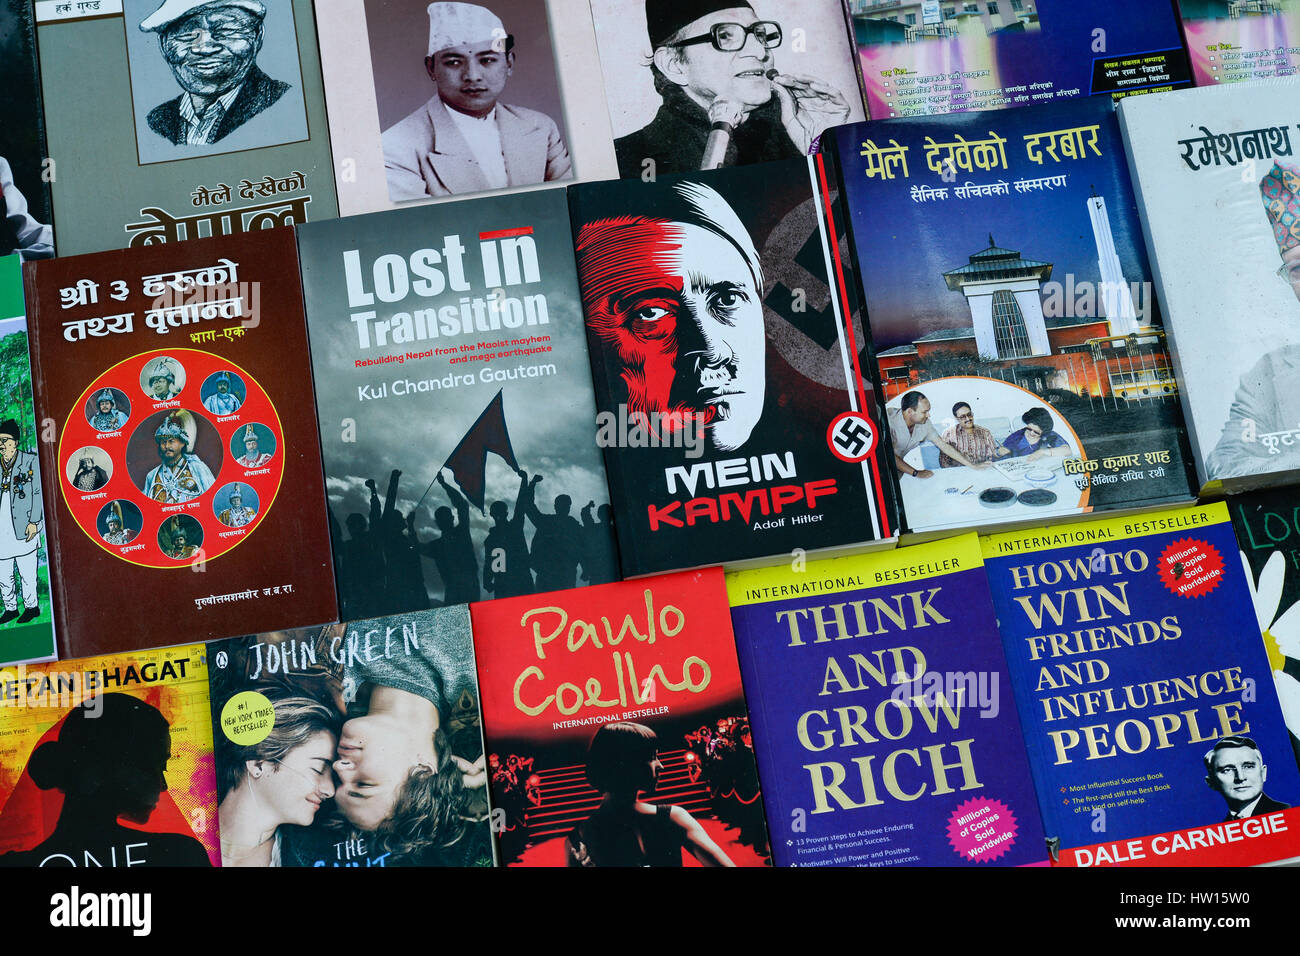 "NEPAL Kathmandu, book seller on street, selling Nazi book of Adolf Hitler ""Mein Kampf"" my struggle beside Paul Coelho, Stock Photo"